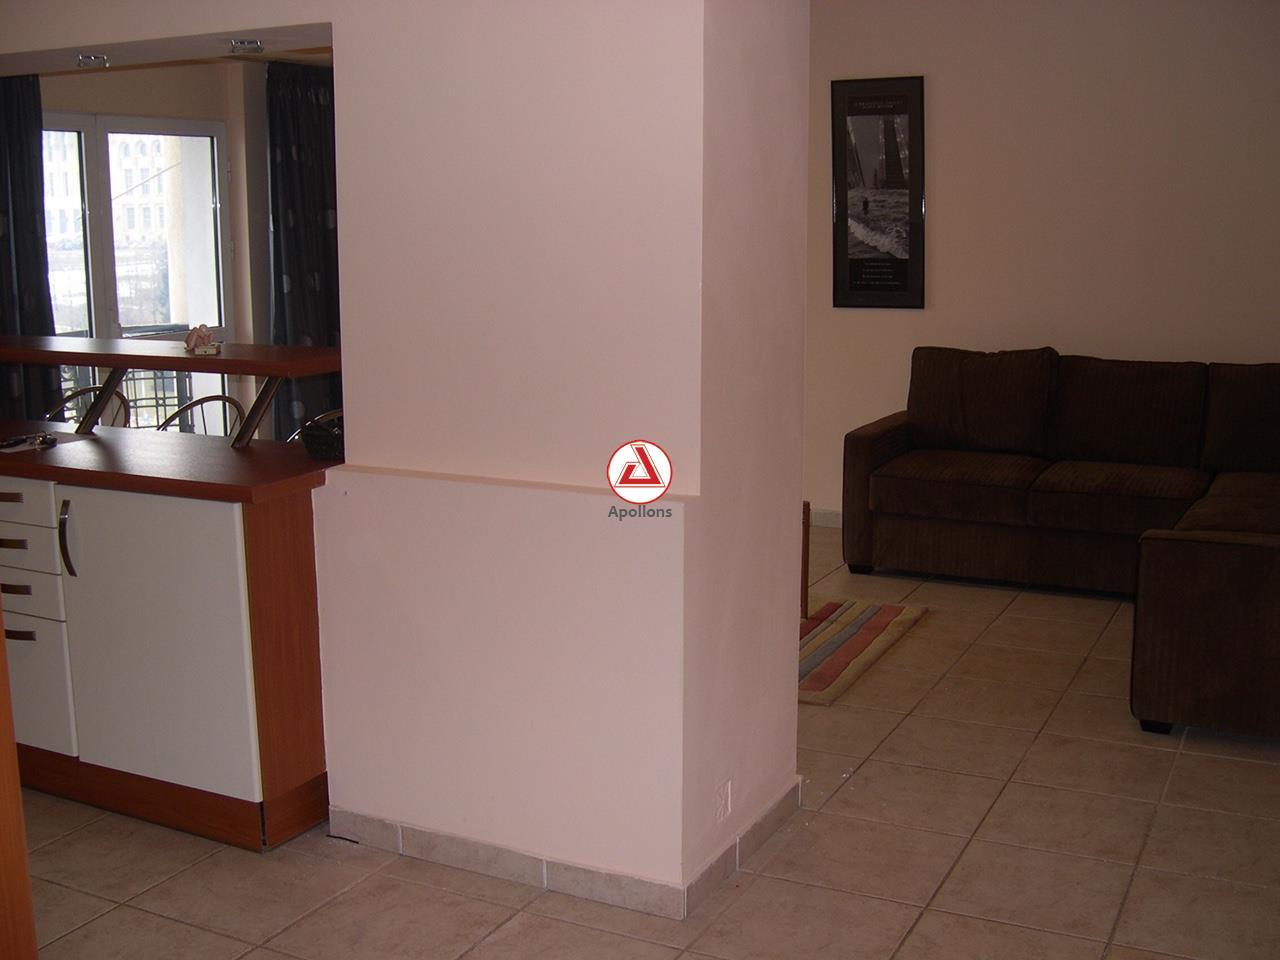 Vanzare apartament 2 camere, renovat, Libertatii, Bucuresti